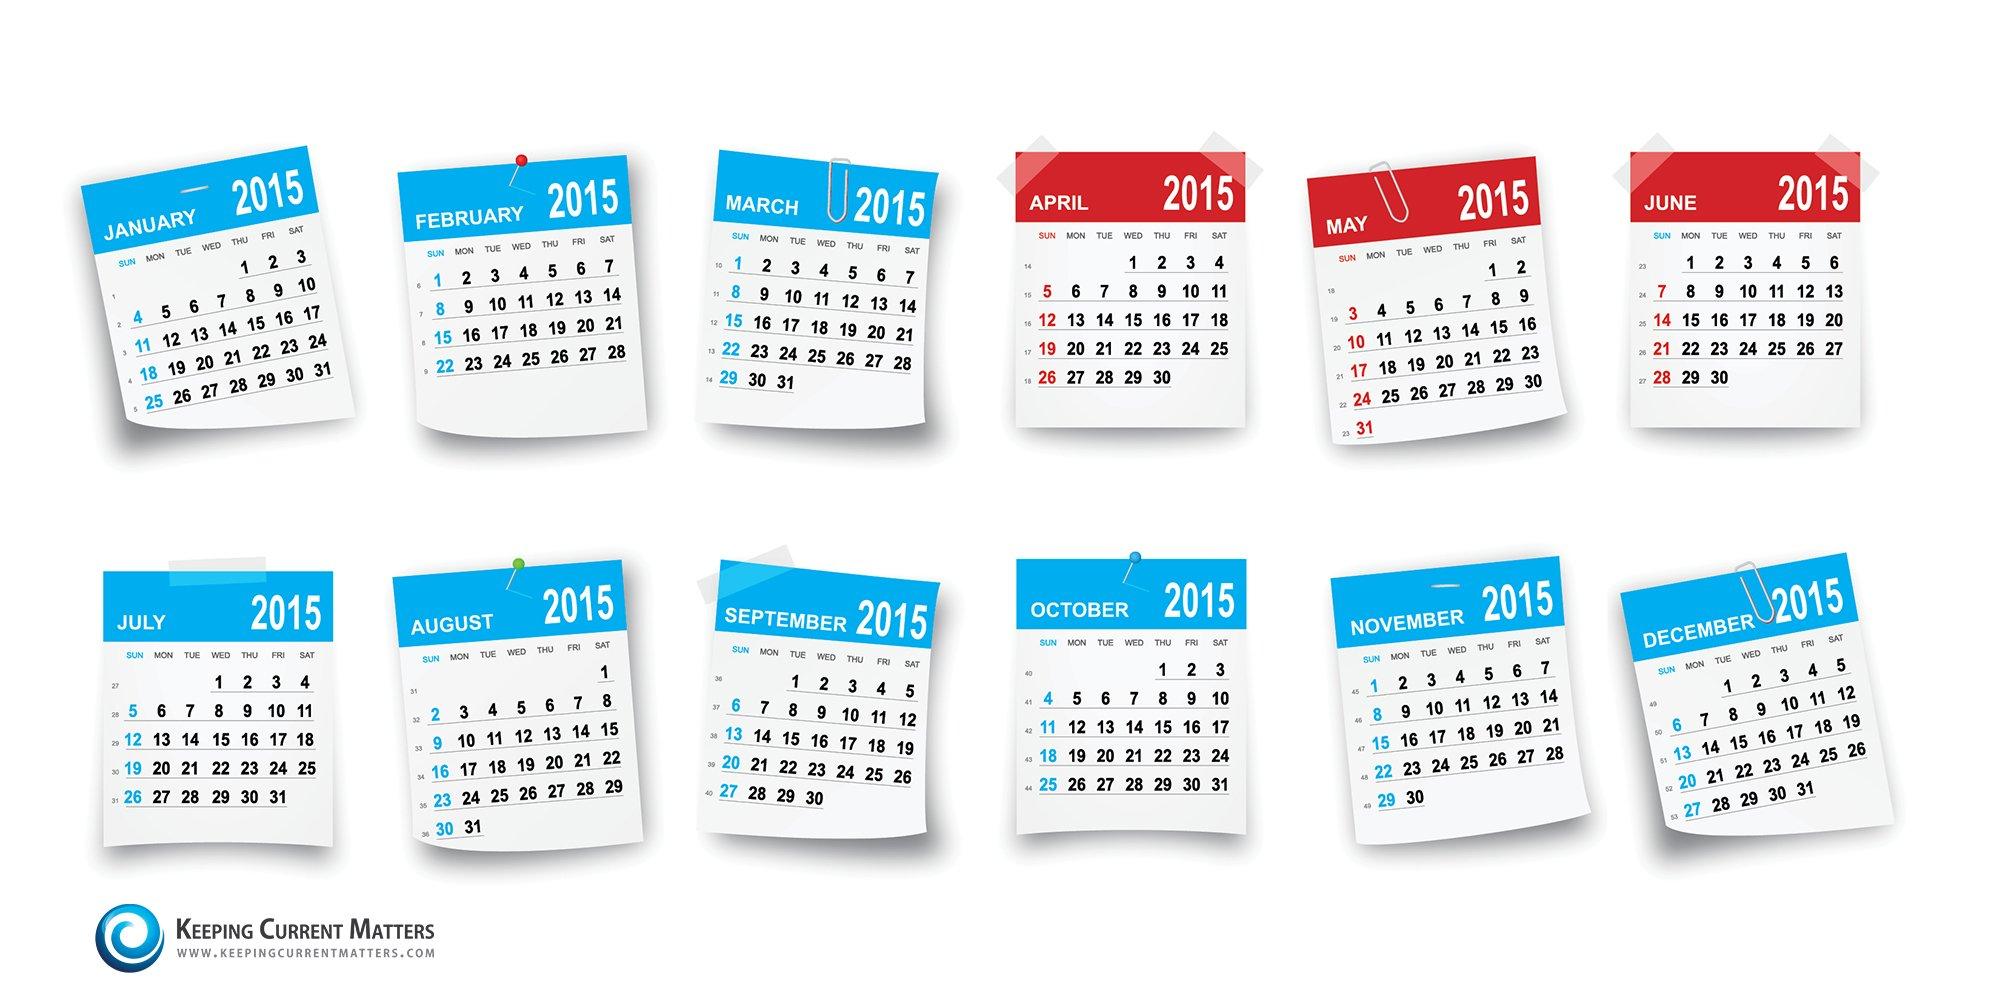 Calendar-2015-KCM